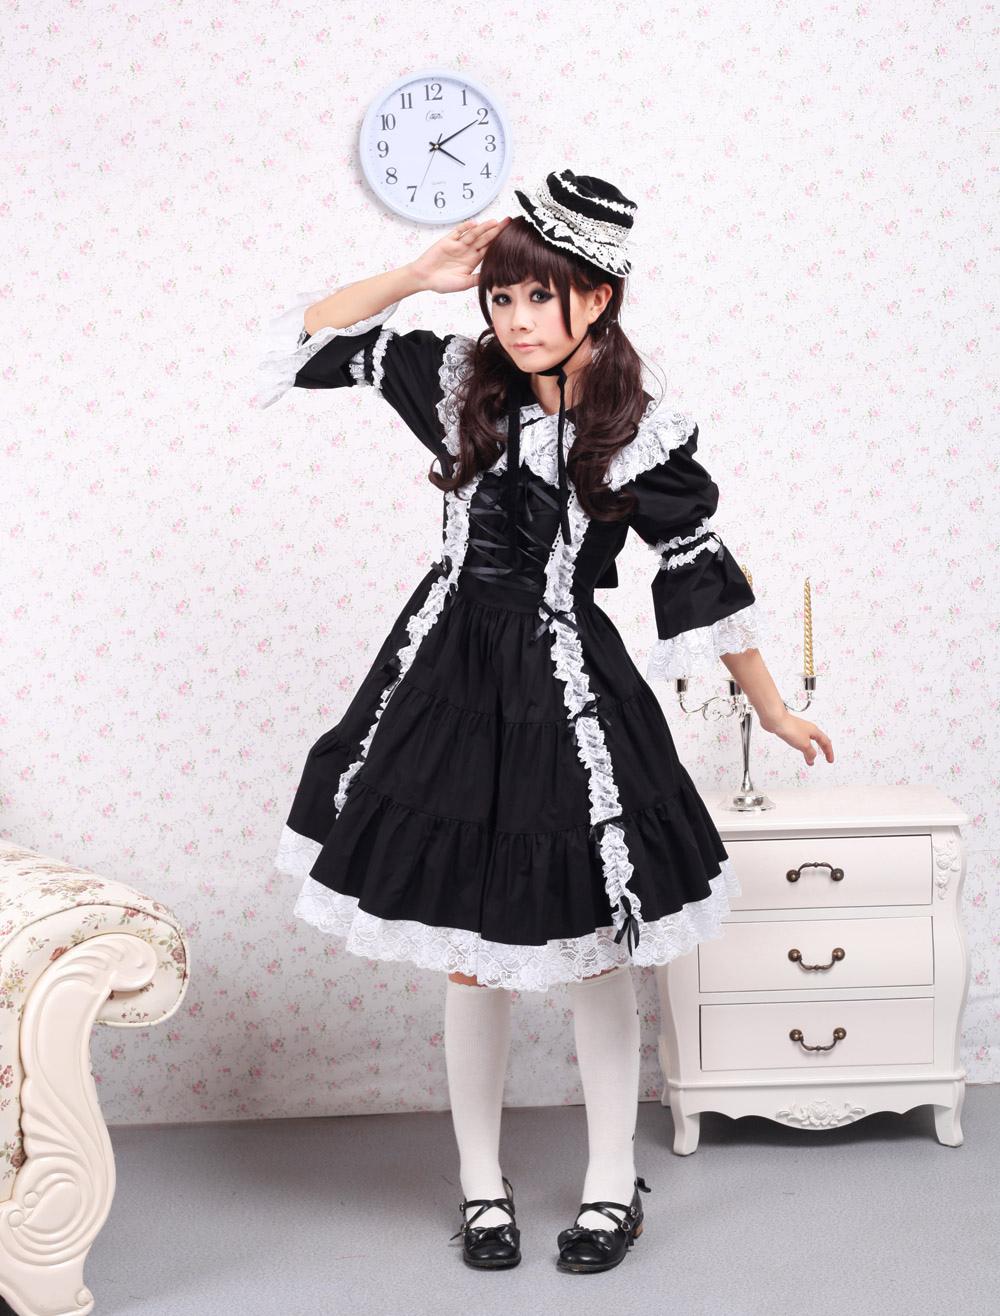 Cotton Black Long Sleeves Classic Lolita Dress (Costumes) photo